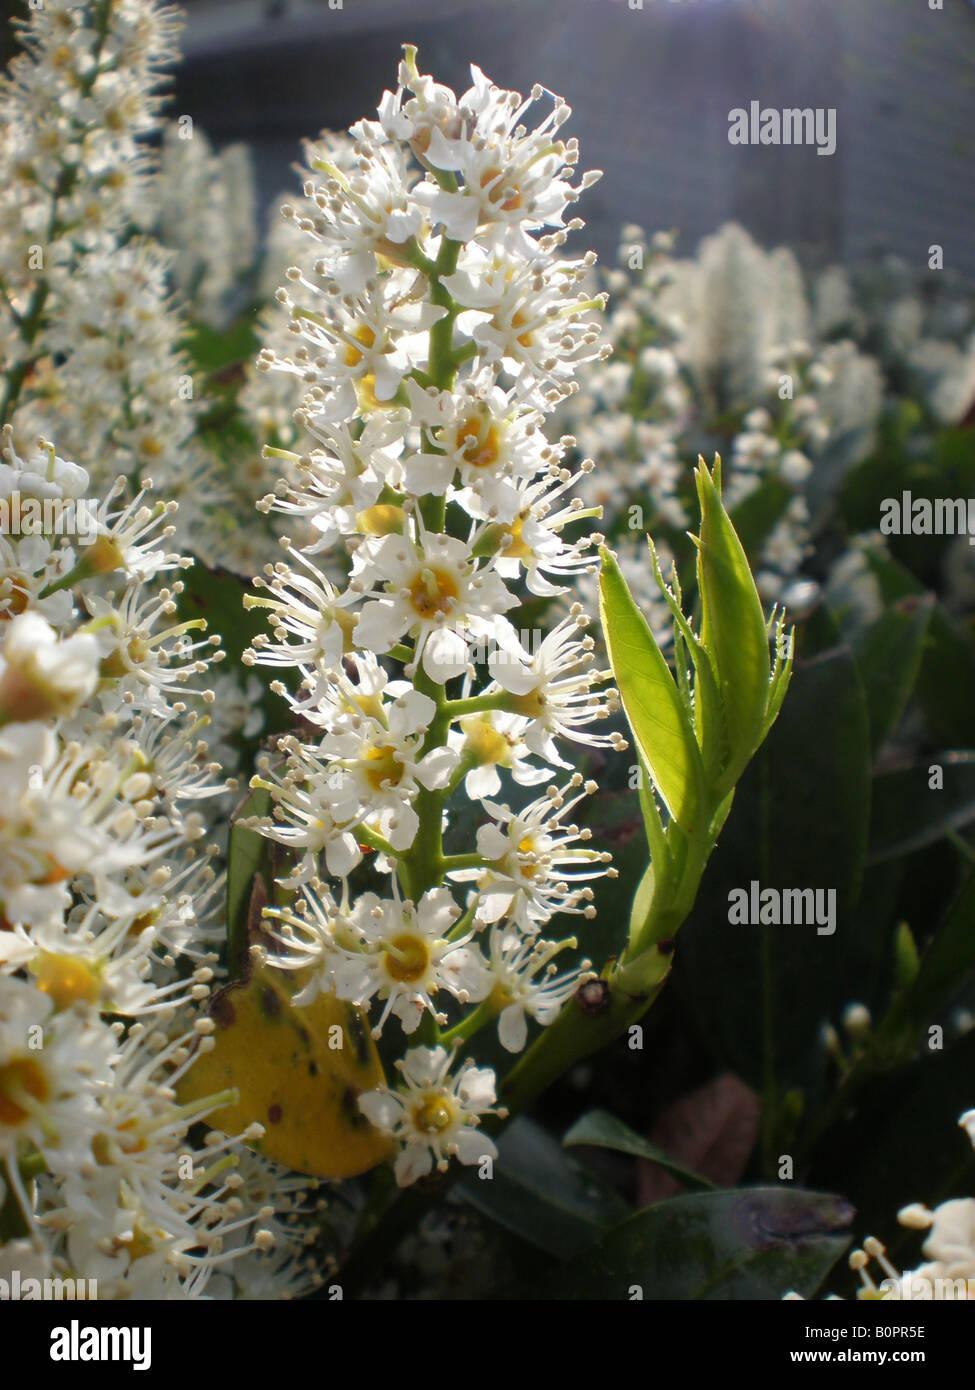 English Laurel Otto Lukyen (Prunus laurocerasus) Stock Photo